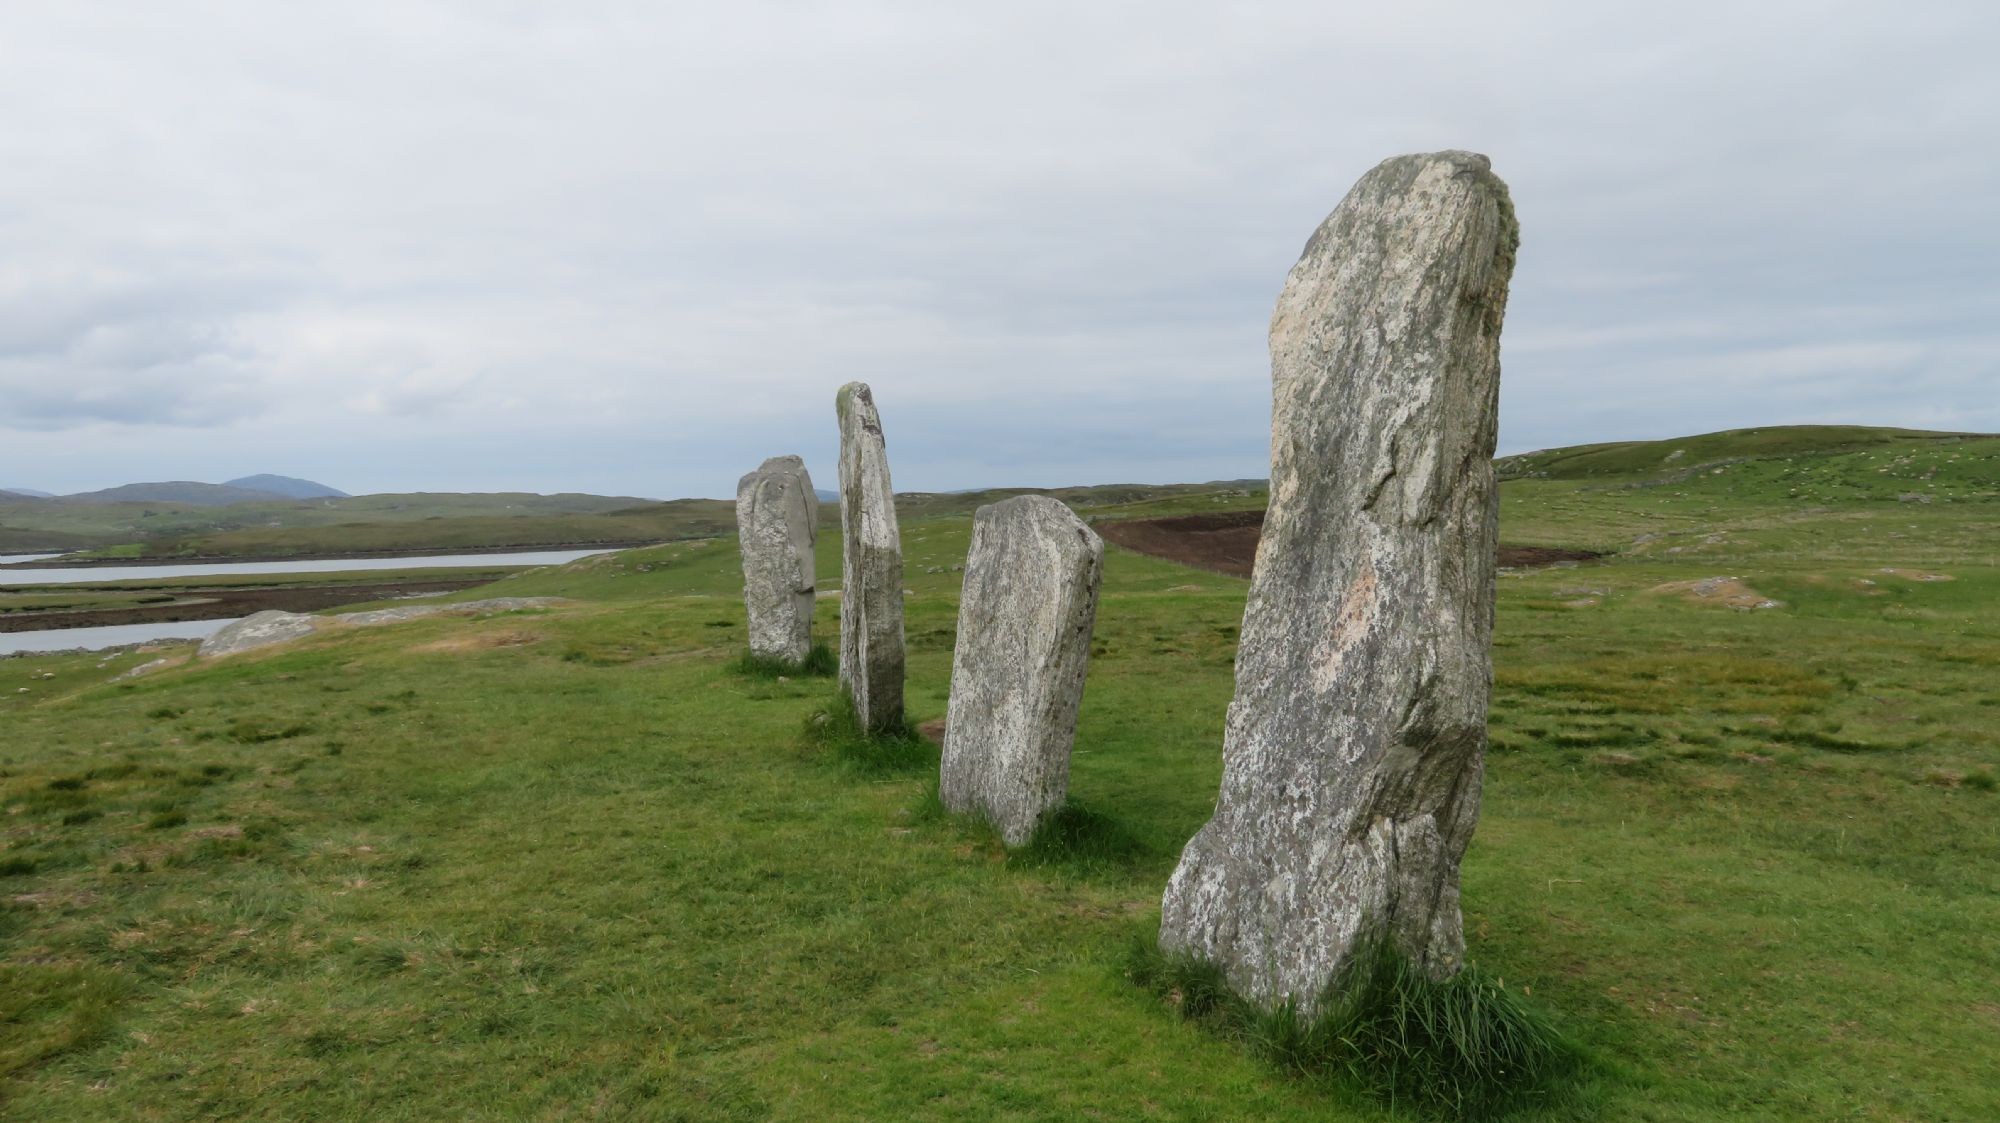 More Stones ....